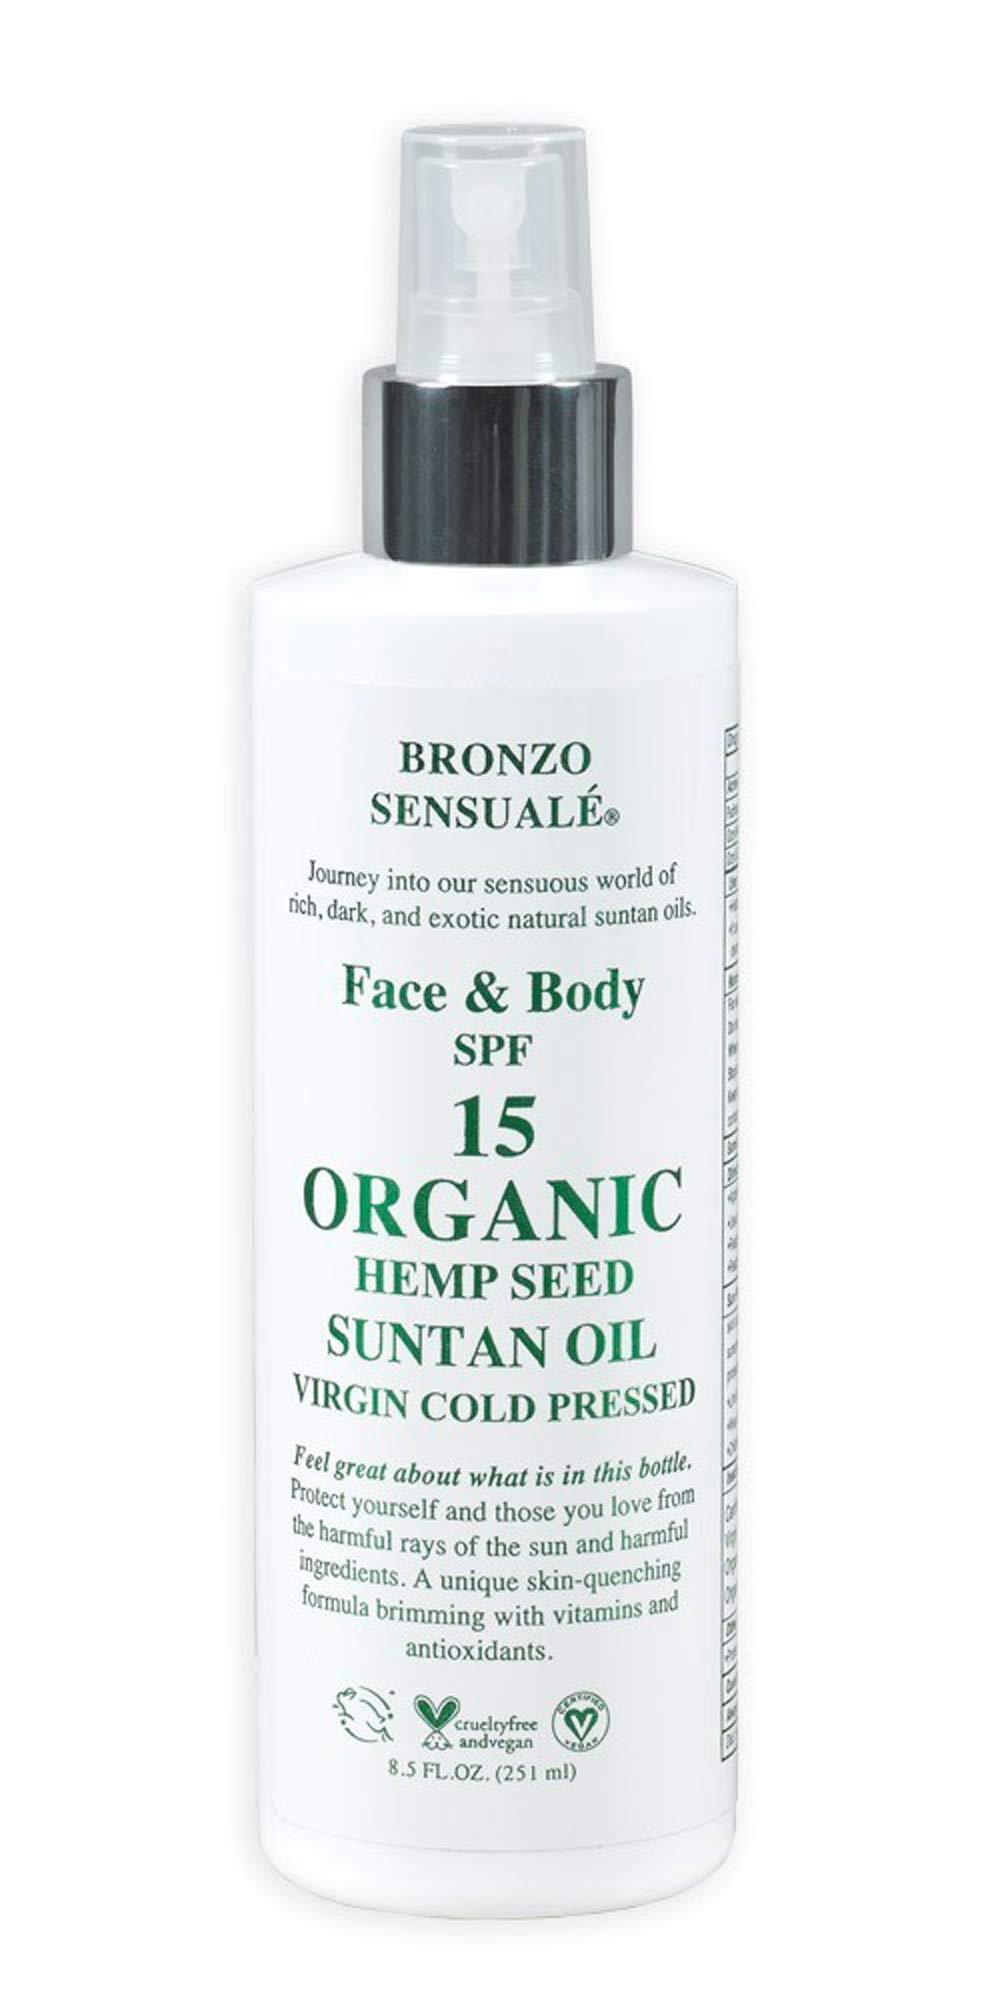 Bronzo Sensualé SPF 15 Sunscreen Organic Deep Tanning Hemp Seed Oil 8.5 Oz.